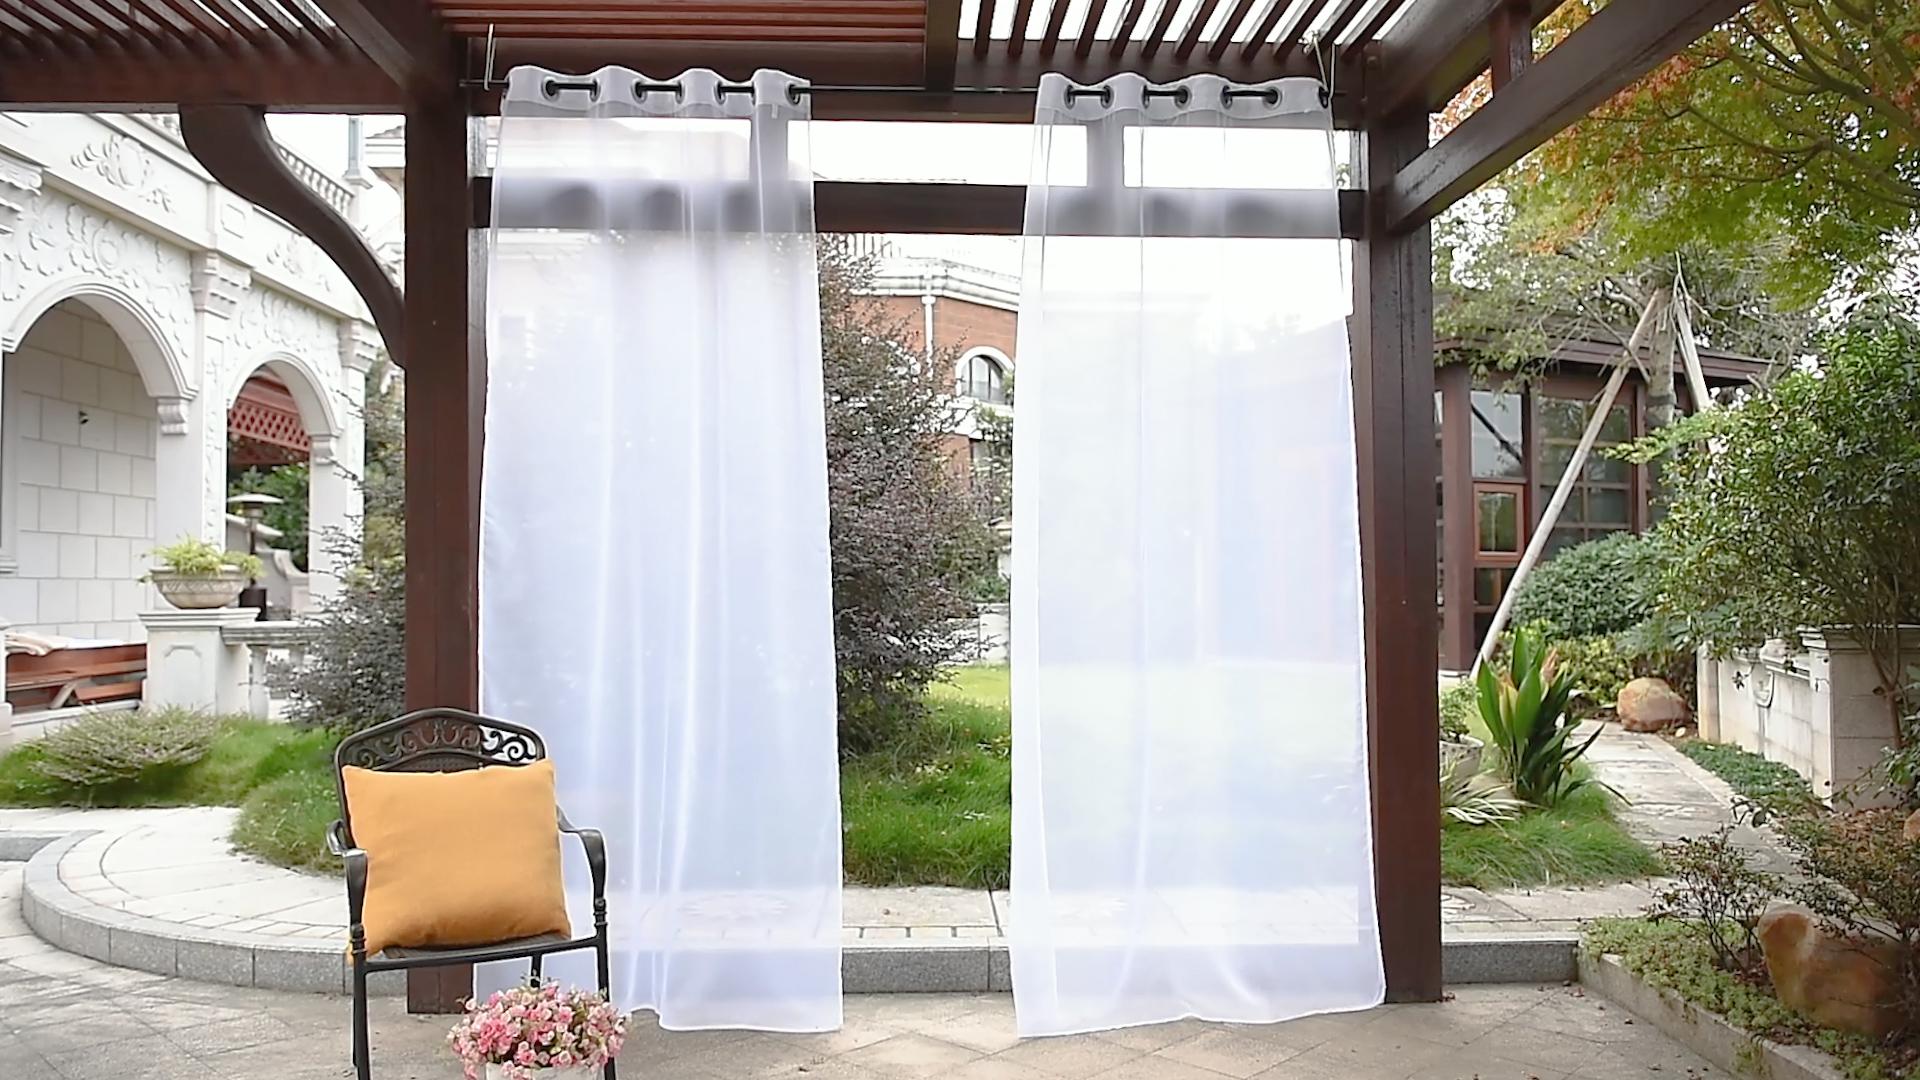 Flipboard Pony Dance Patio Gazebo Curtains White Sheer Curtain